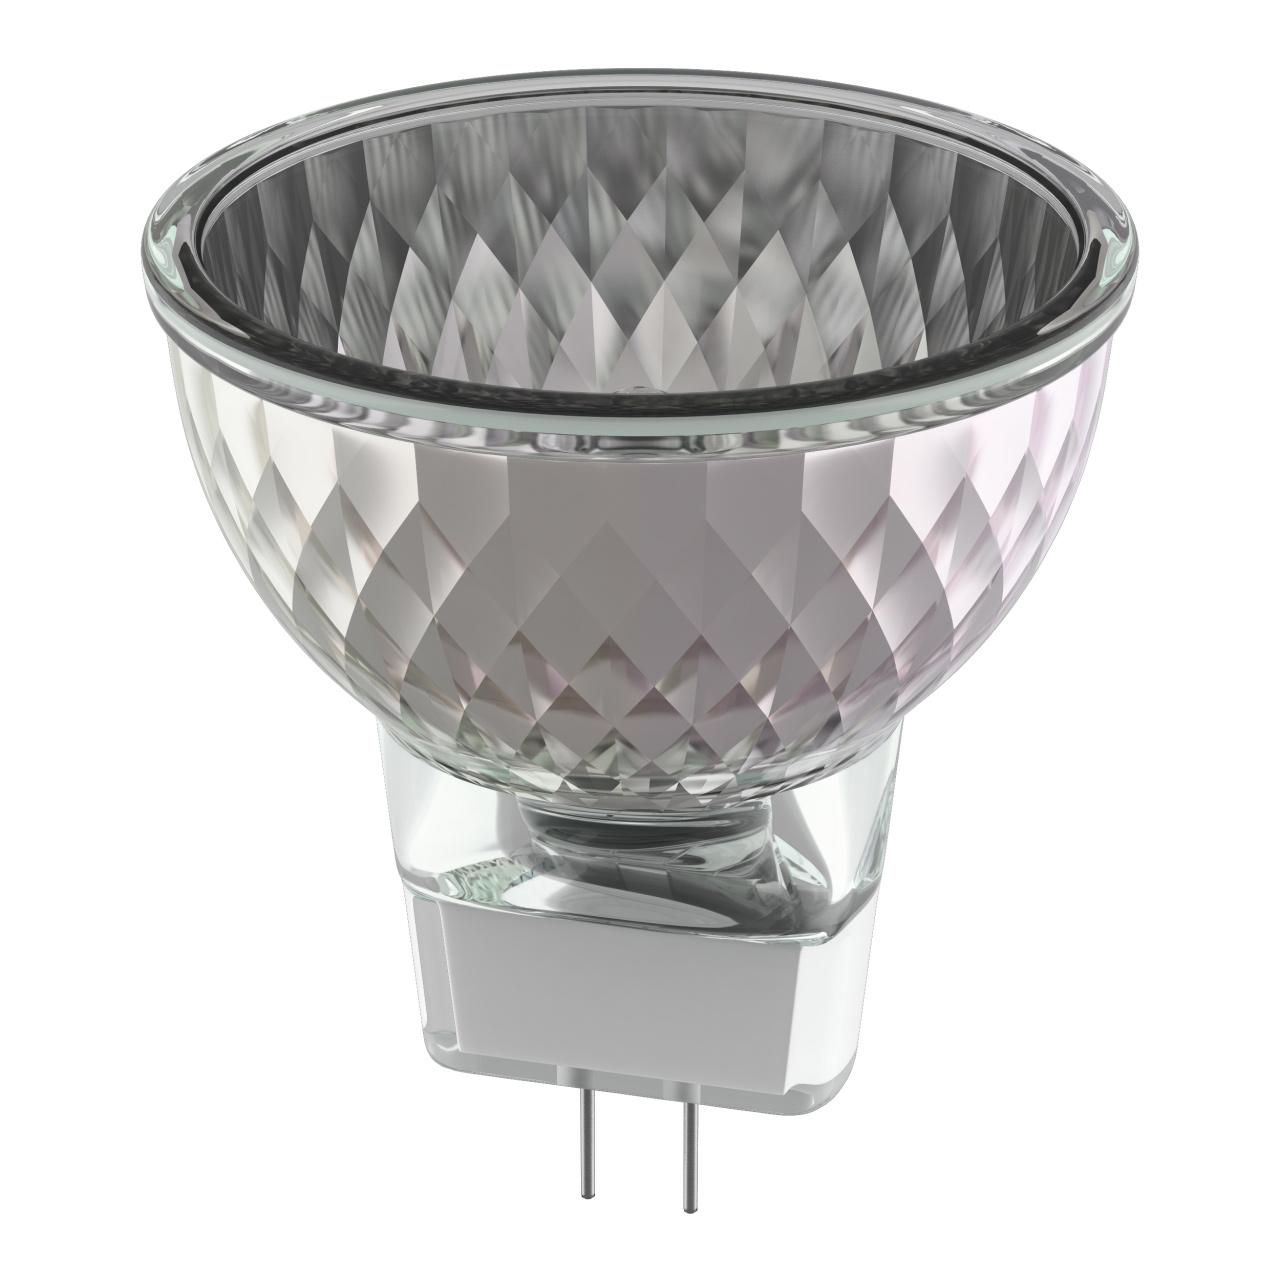 Лампа HAL 12V MR11 G4 35W 30G RA100 2800K 2000H DIMM Lightstar 921003